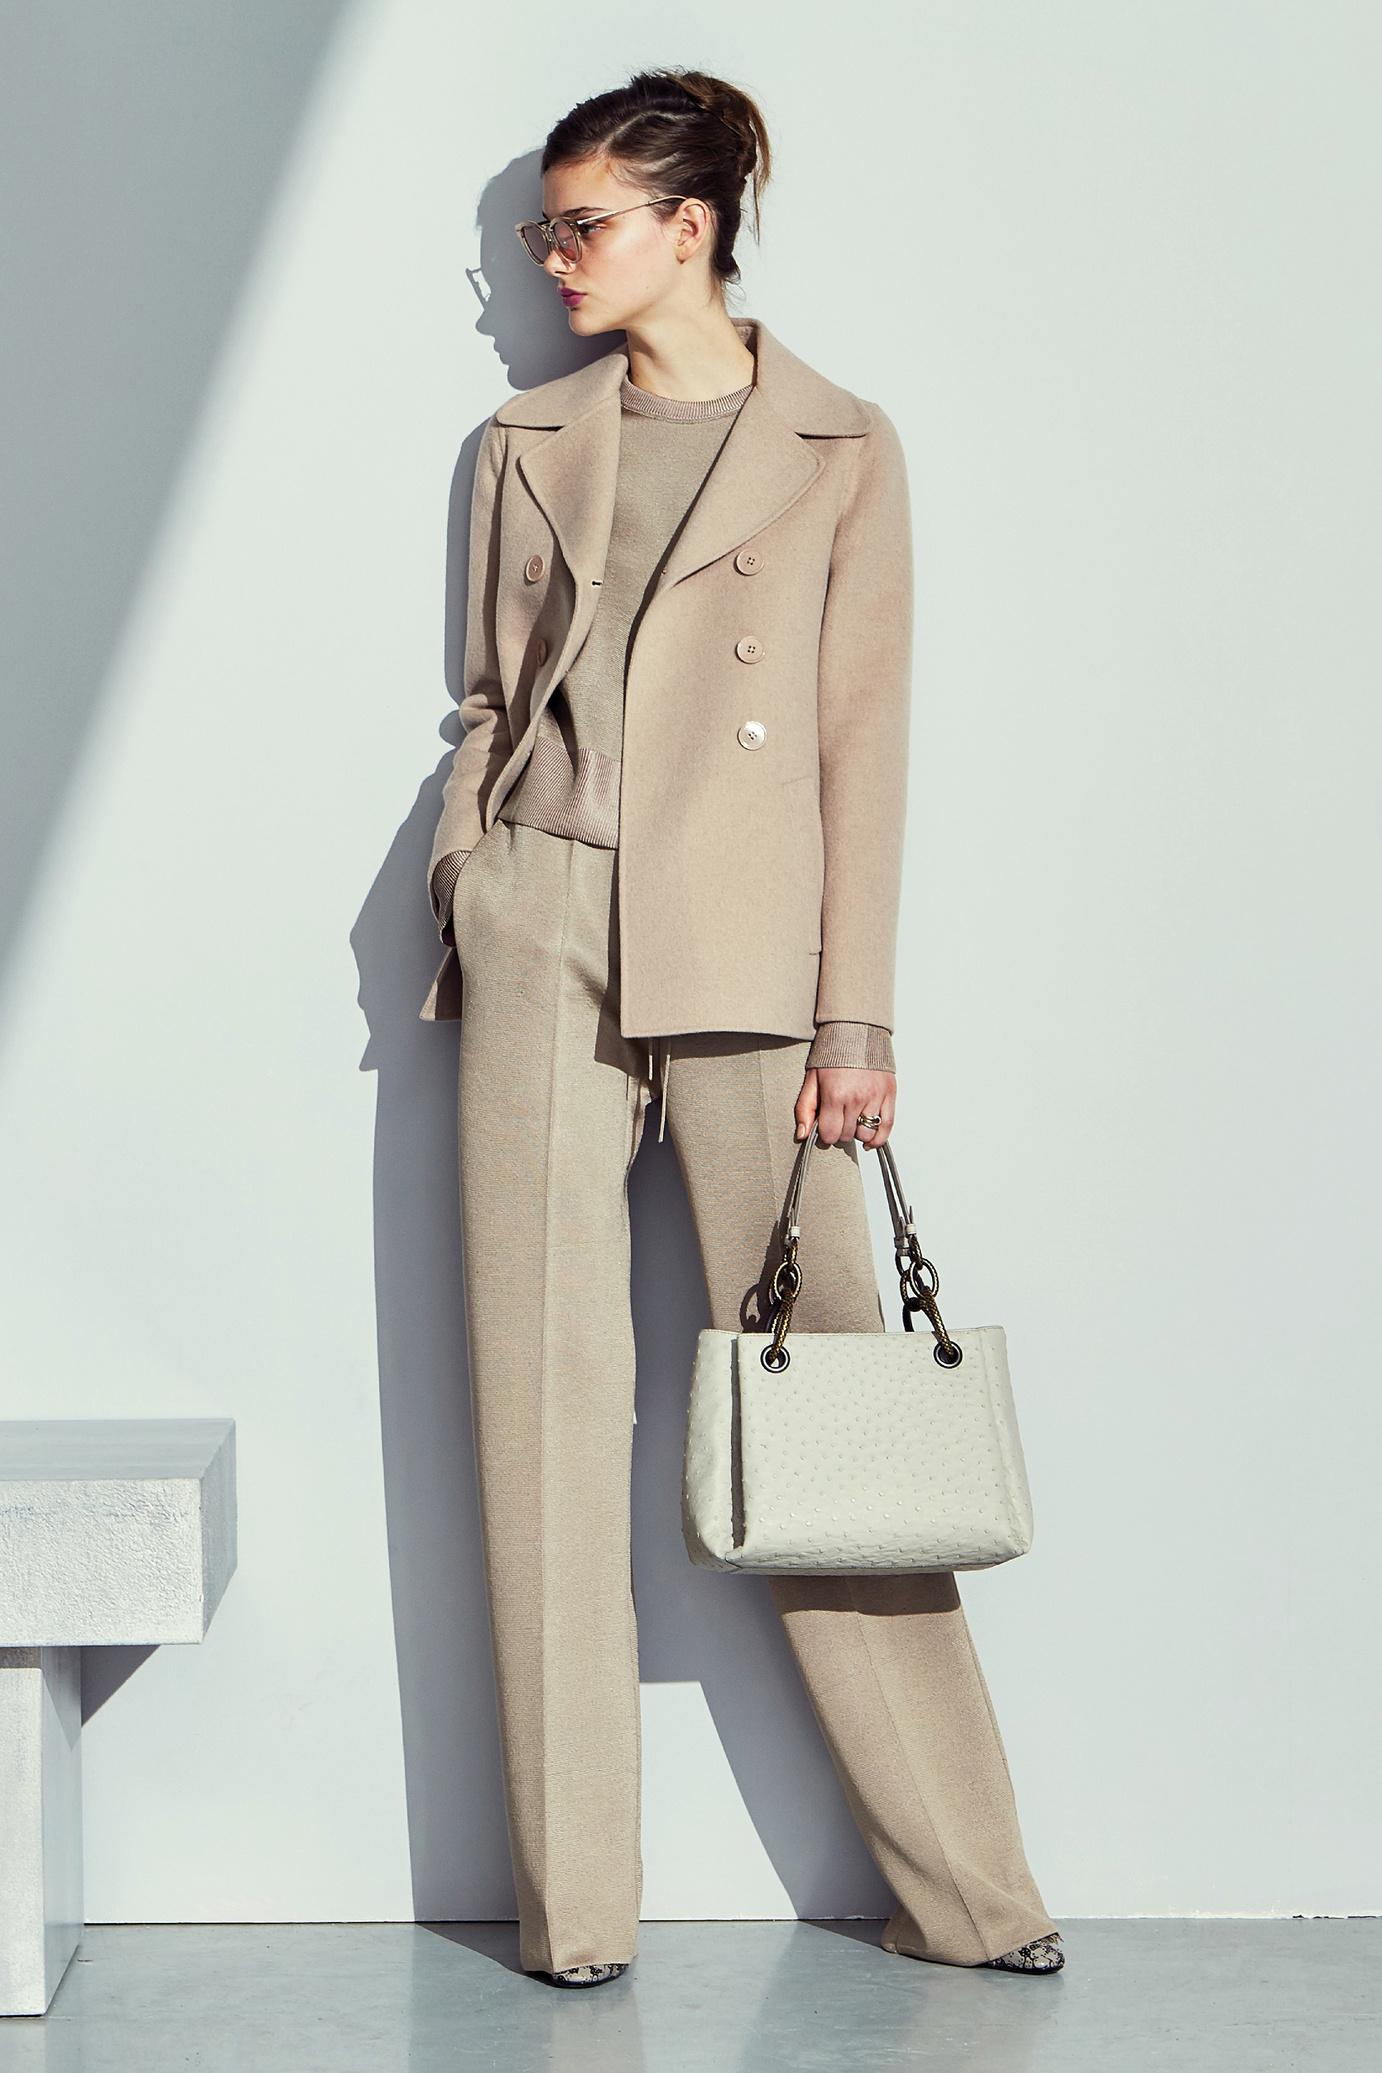 Office fashion women 2018 6